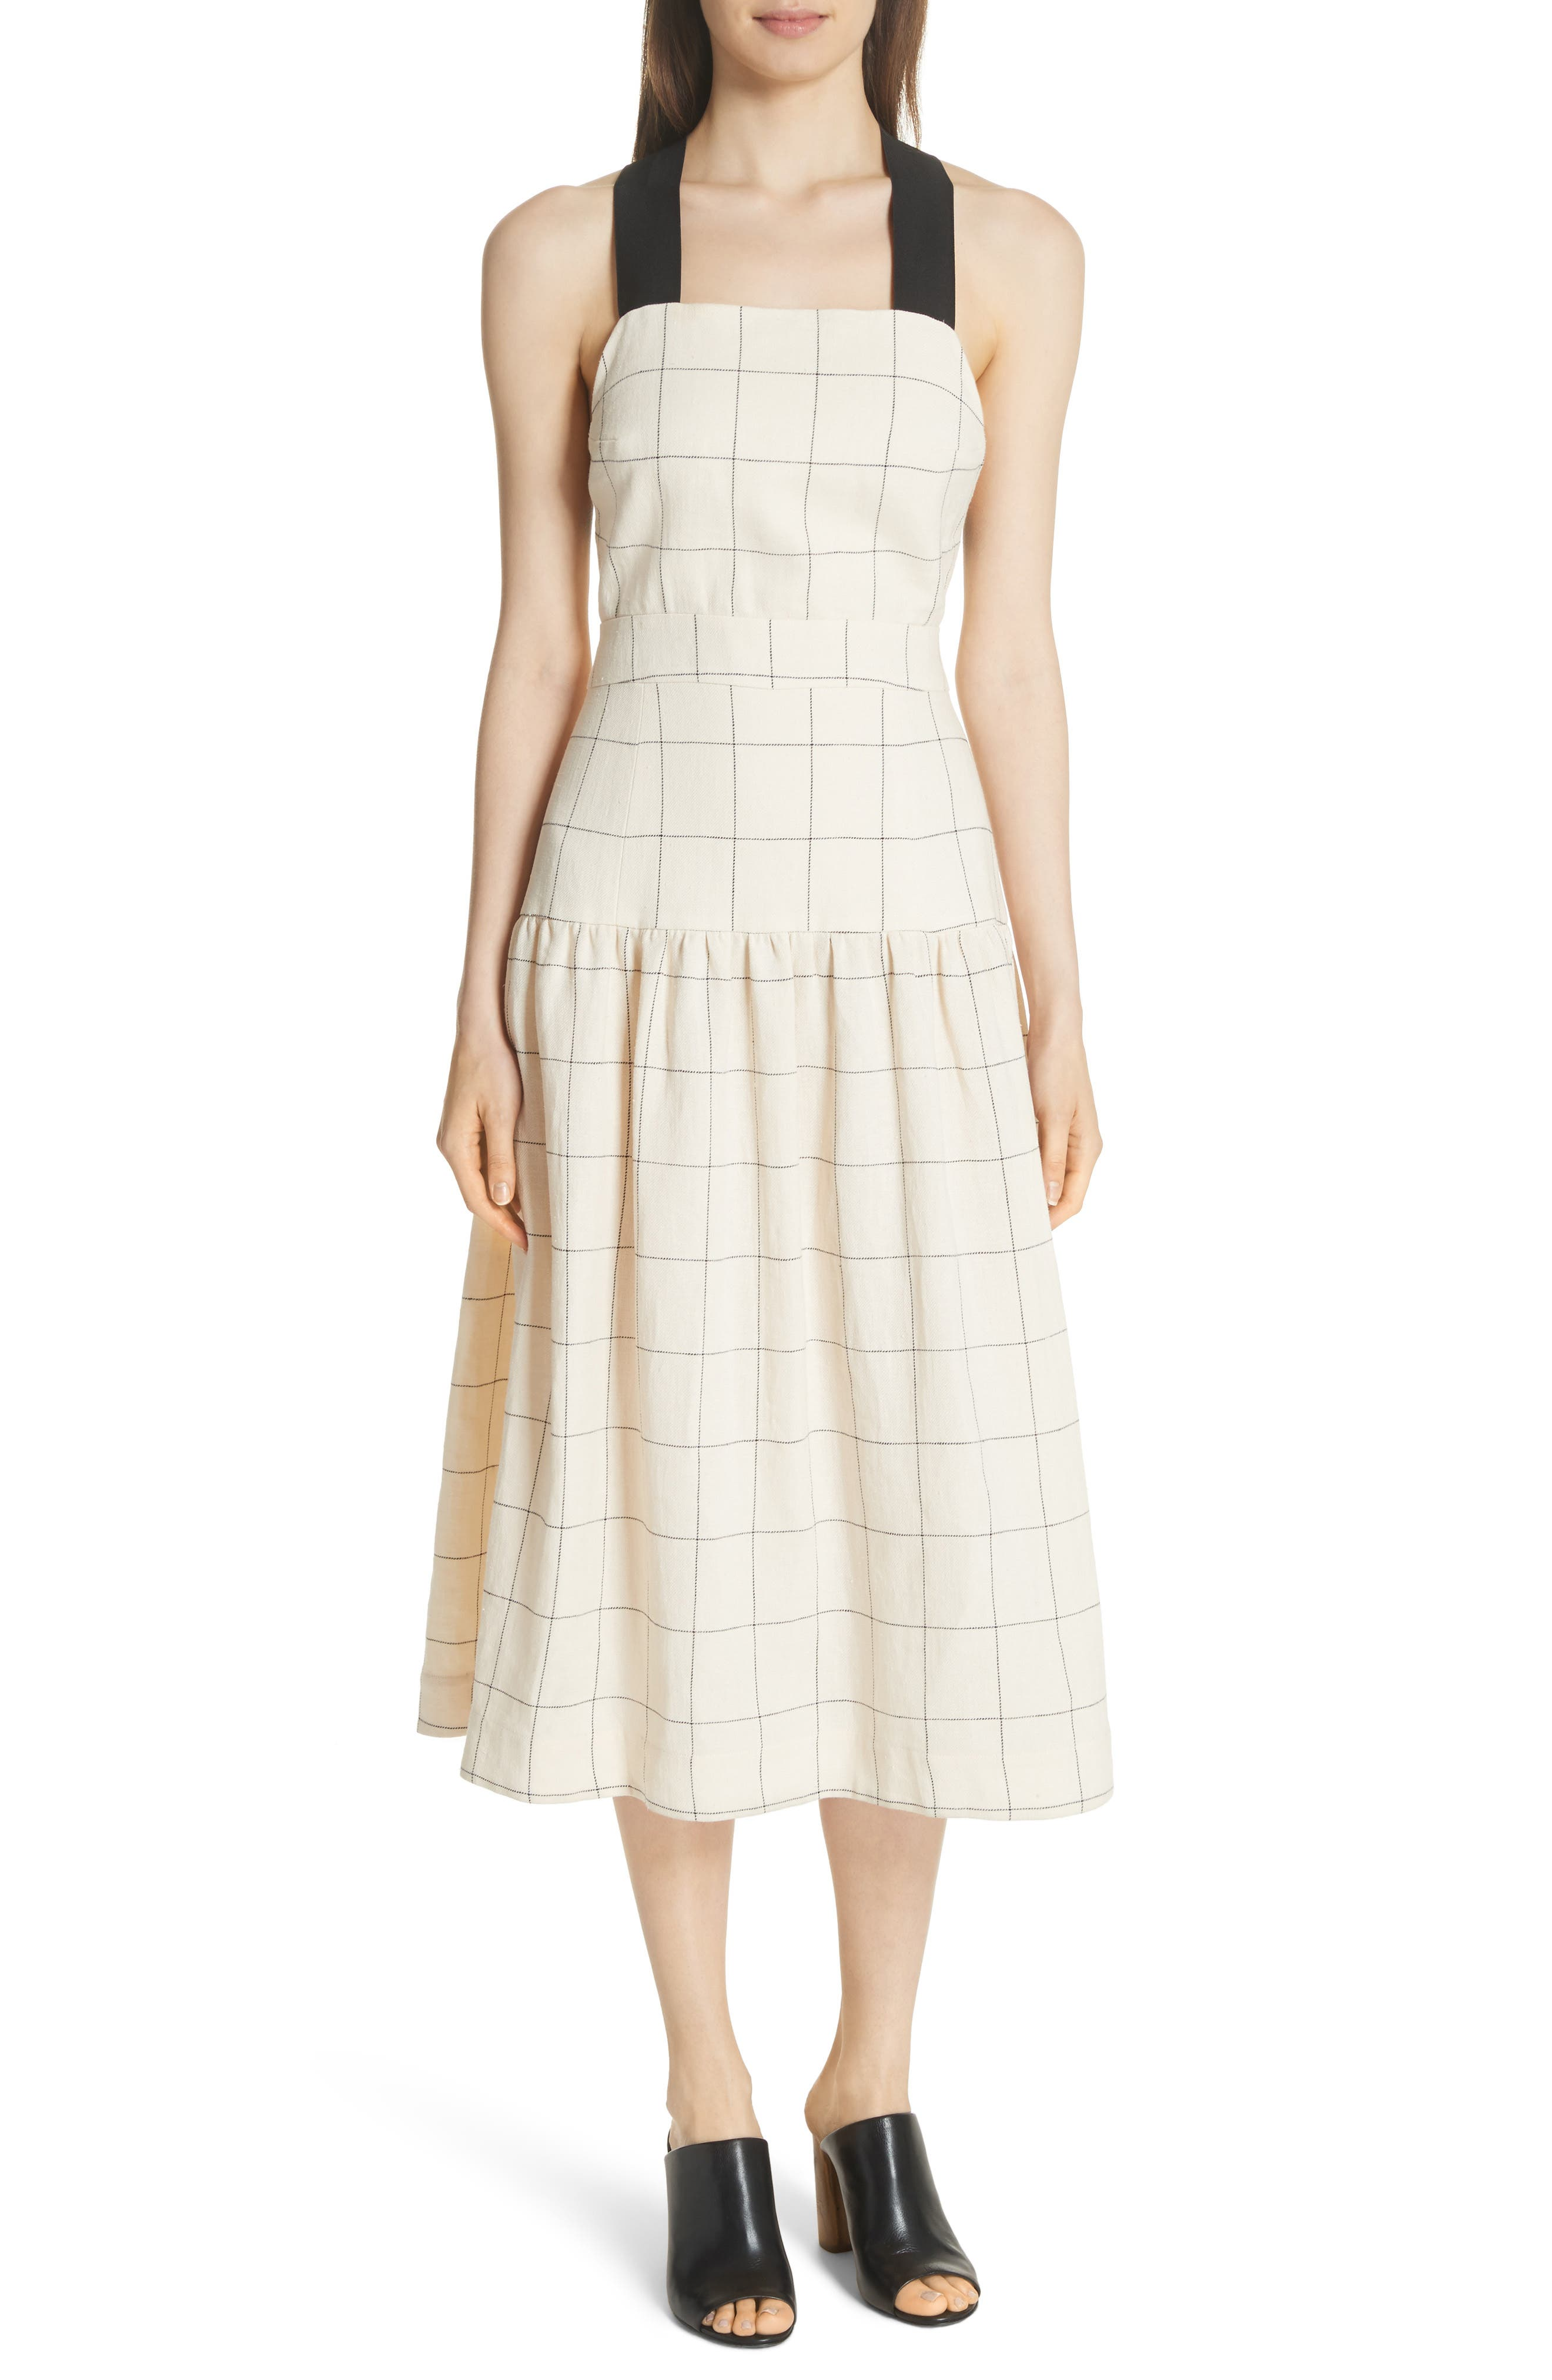 Sea Jacques X-Factor Grid Linen Dress